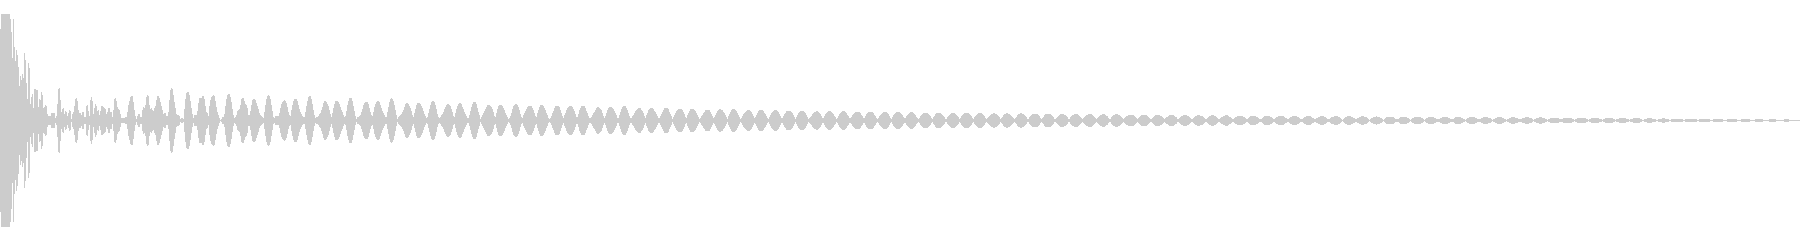 DTM Tom 3 オリジナル音源の未再生の波形